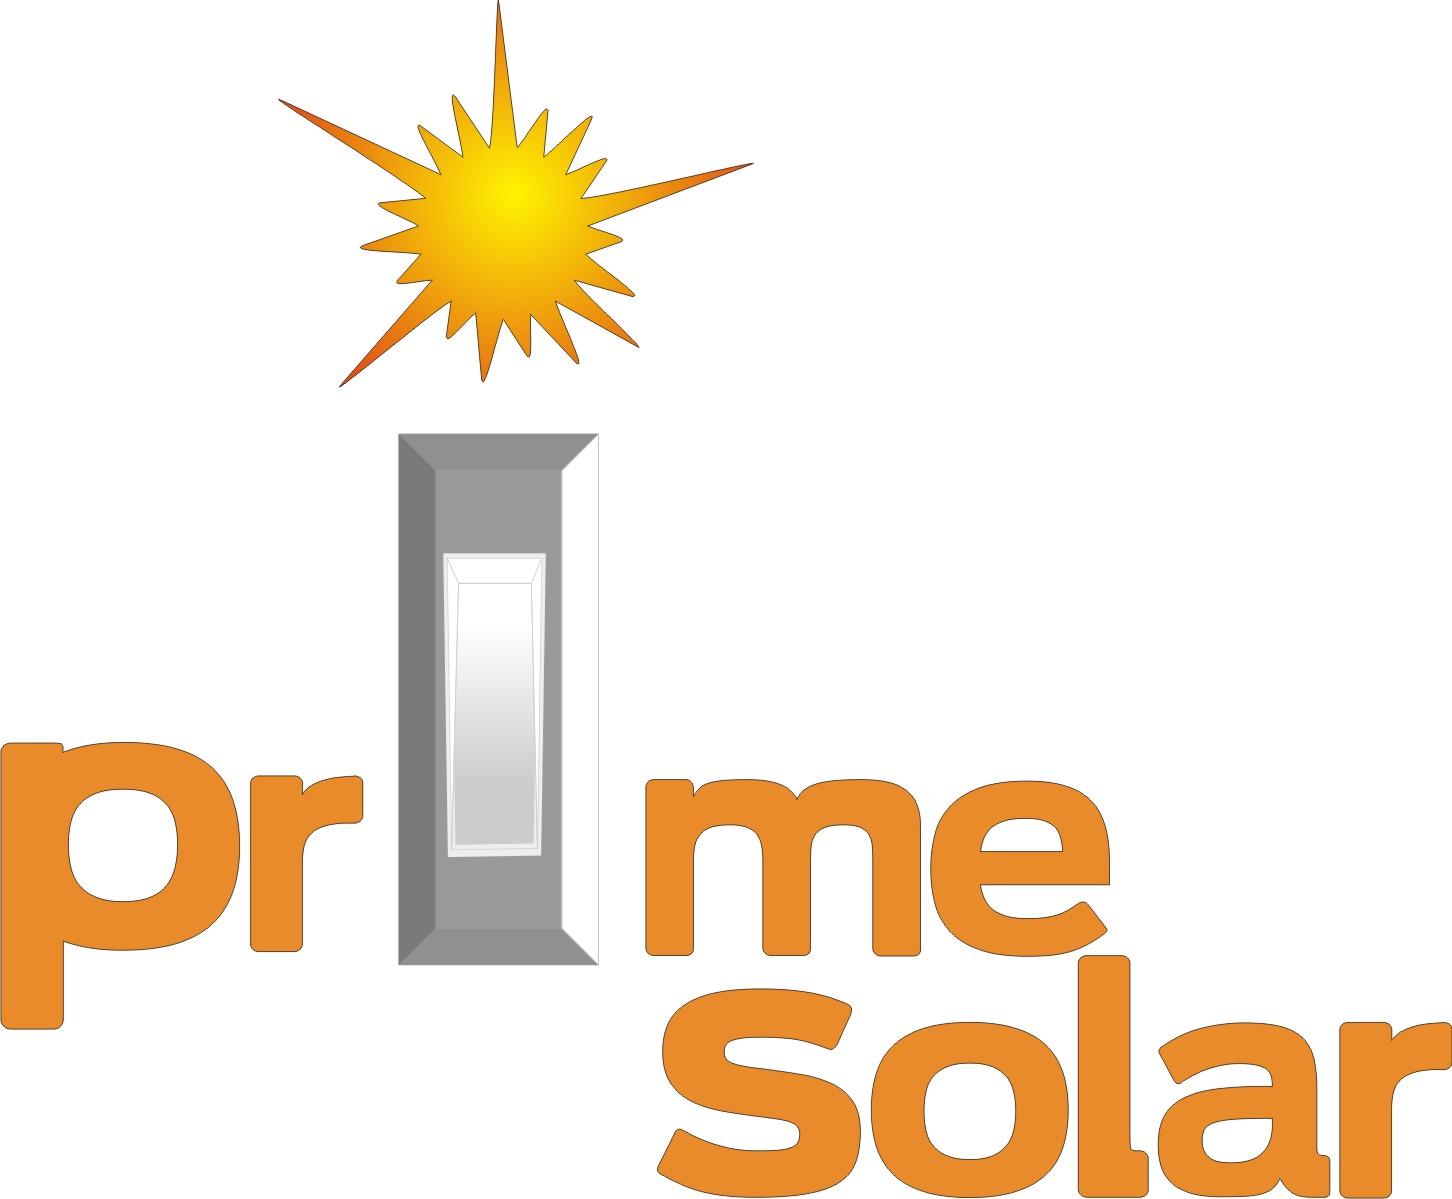 Логотип компании PrimeSolar [UPD: 16:45 15/12/11] фото f_4ef1ed88ab4fb.jpg